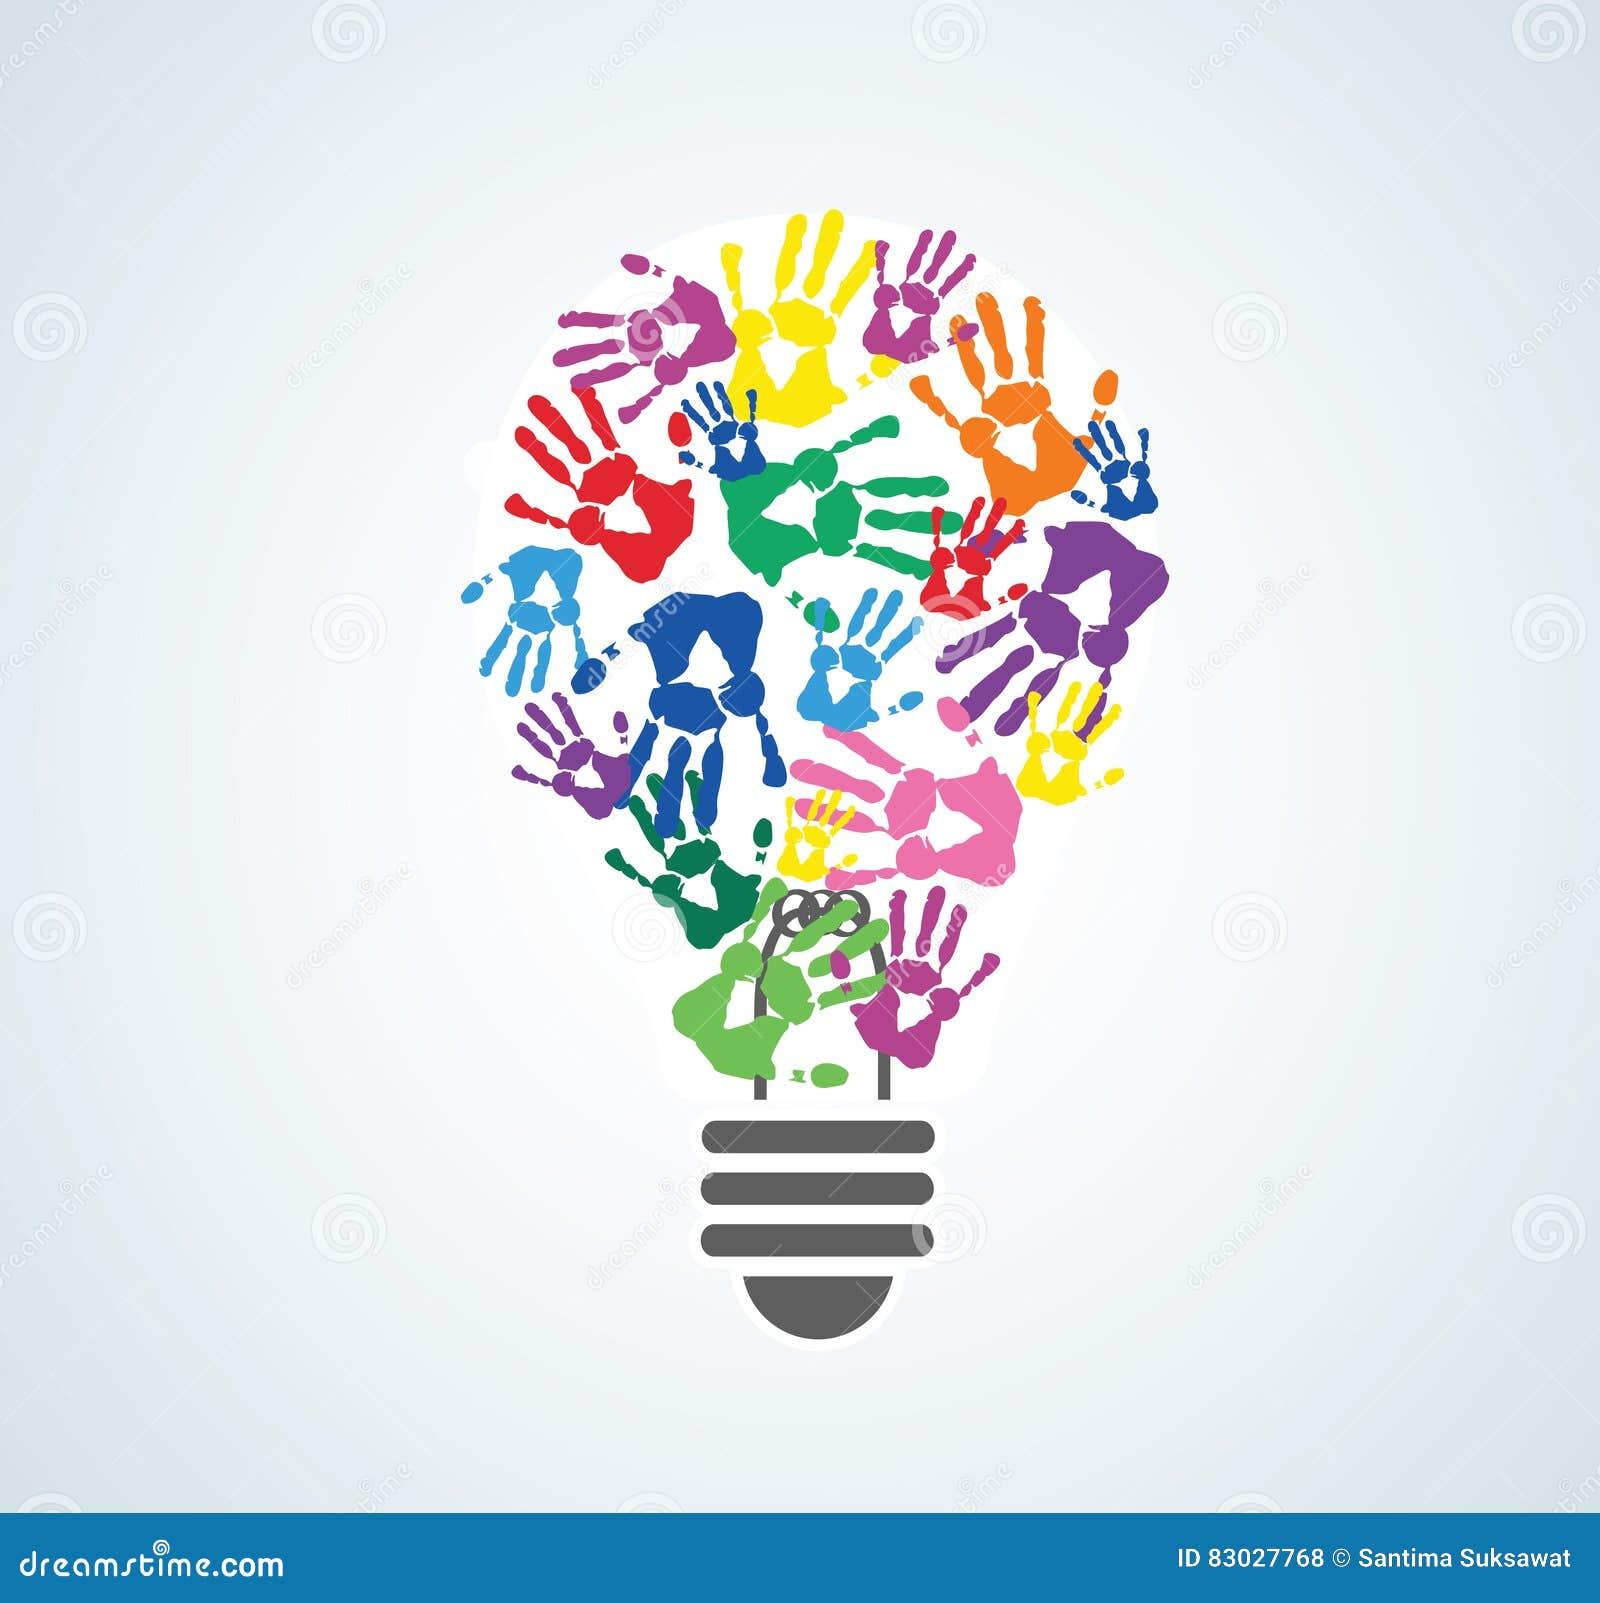 Colorful handprint in lightbulb shape symbol of thinking concept colorful handprint in lightbulb shape symbol of thinking concept biocorpaavc